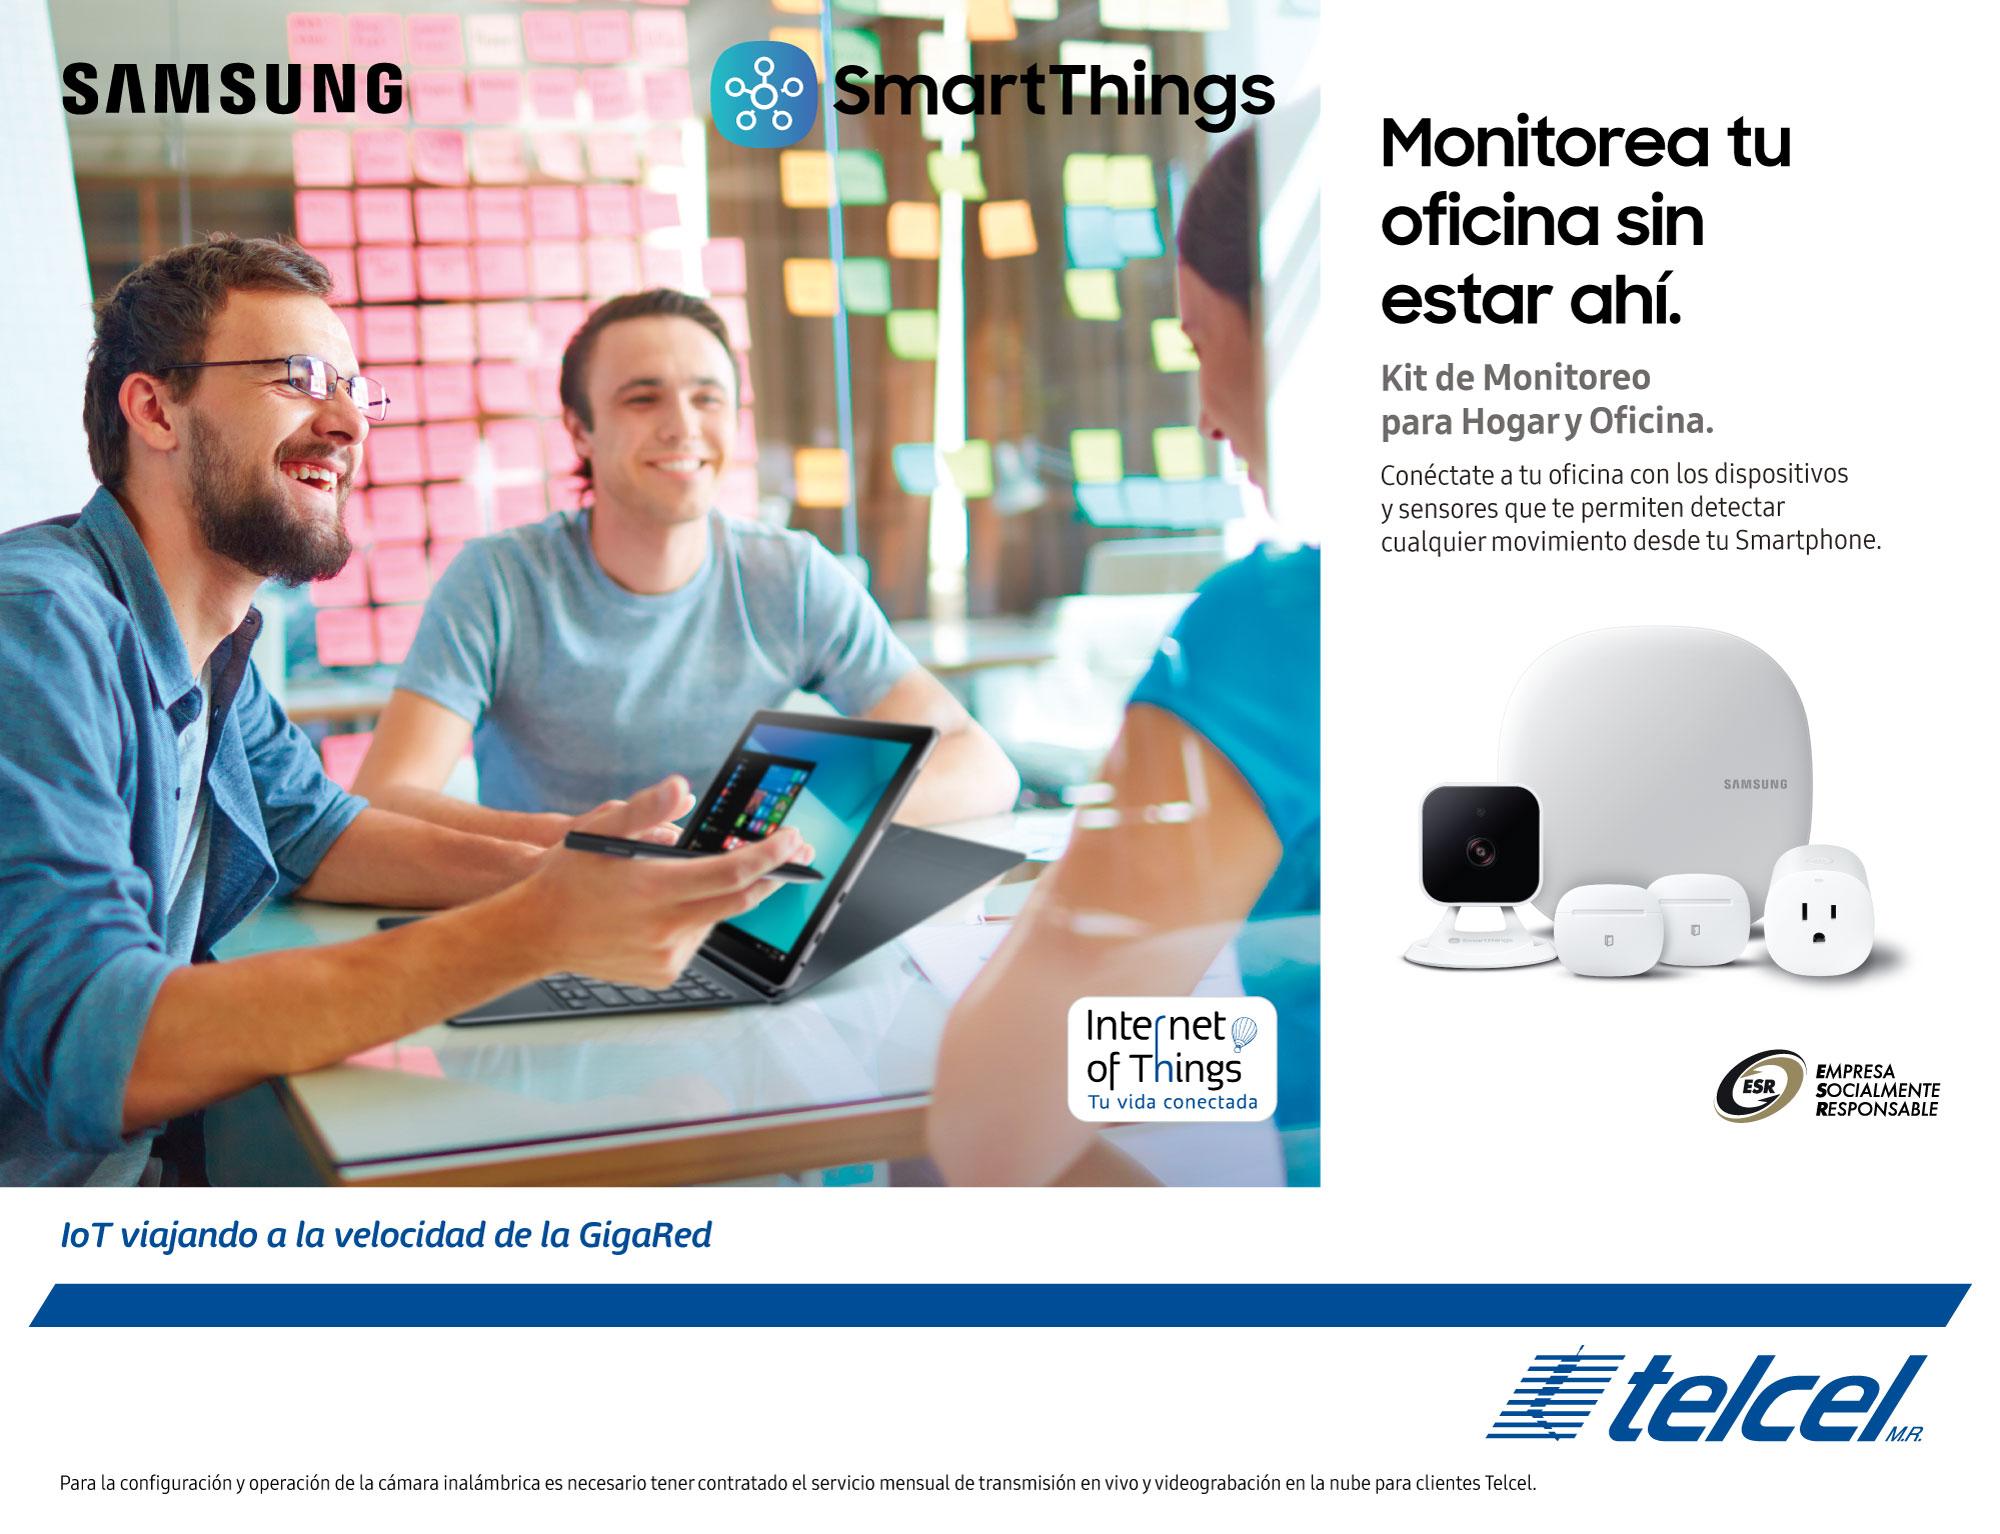 smartThings de Samsung